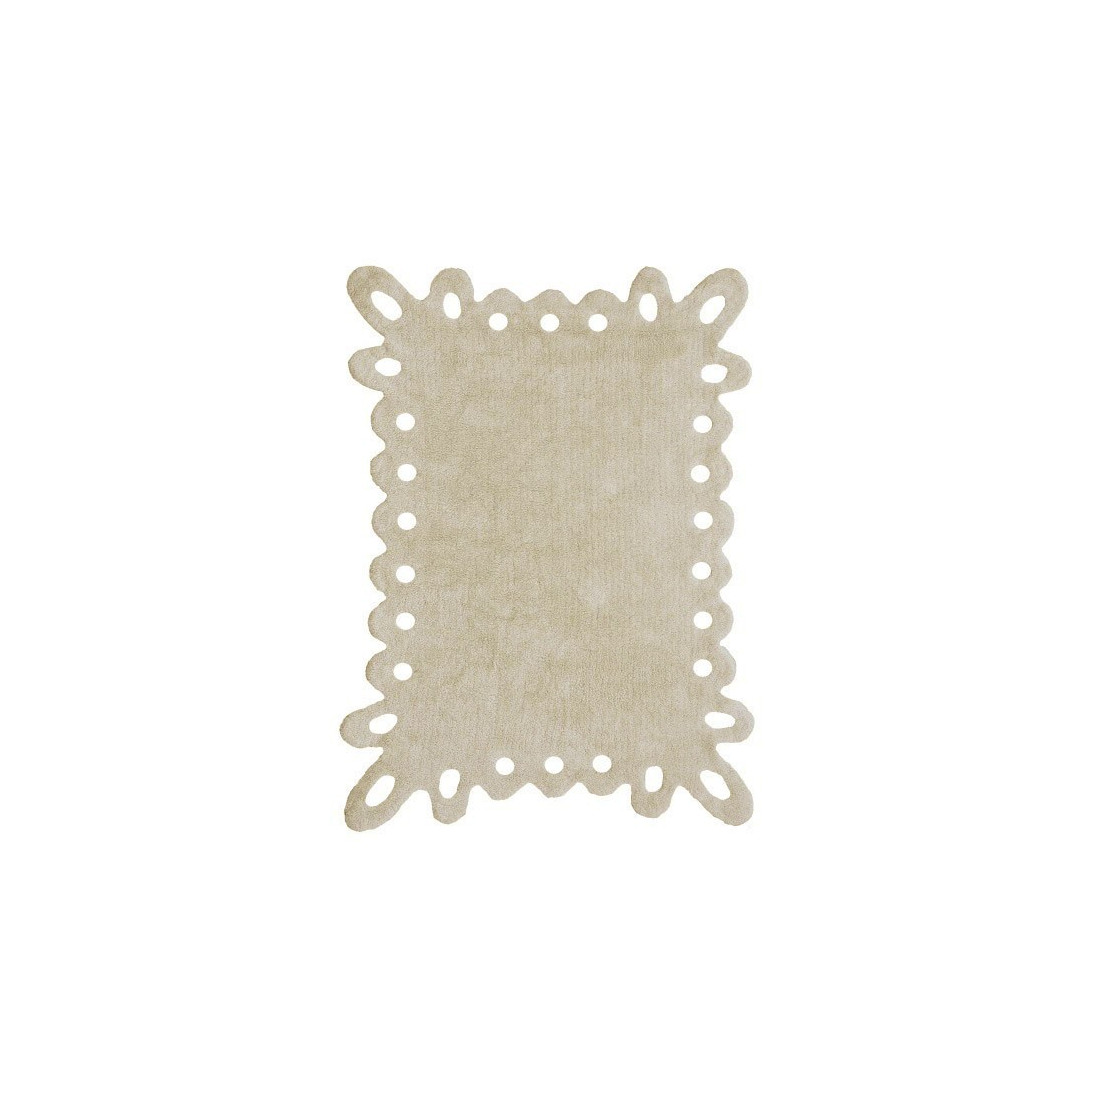 tapis enfant lavable beige puntilla lorena canals ma chambramoi. Black Bedroom Furniture Sets. Home Design Ideas